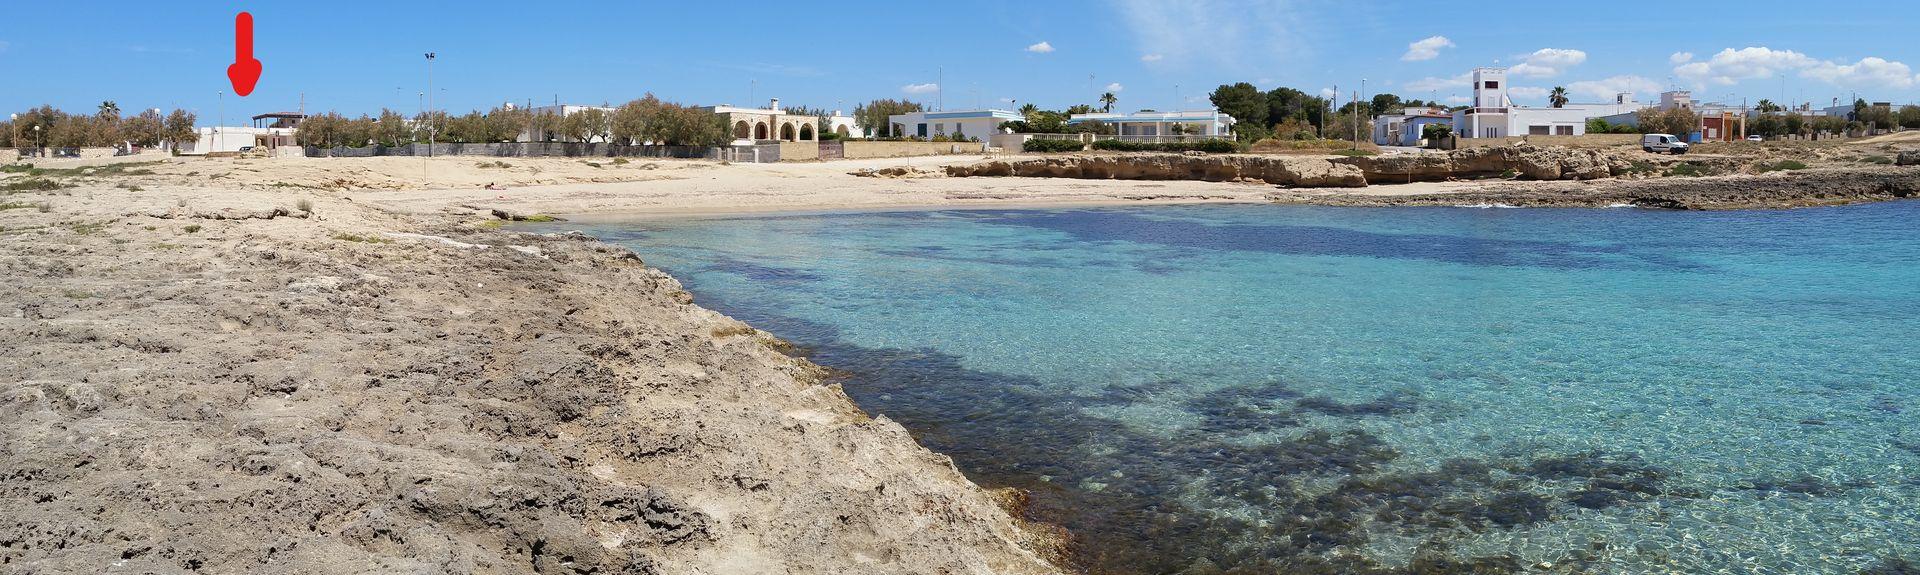 Galatina Station, Galatina, Puglia, Italy